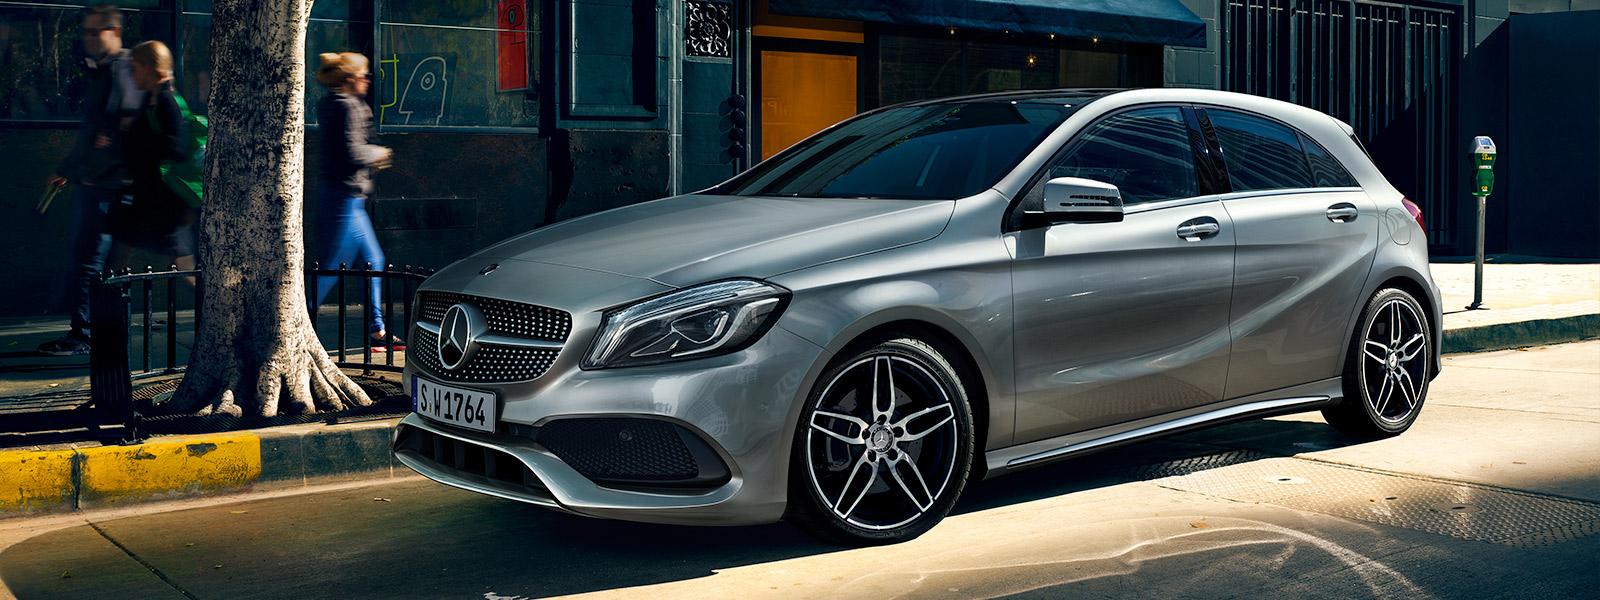 Flexible Car Leasing  UK Car Hire  Van Rental from